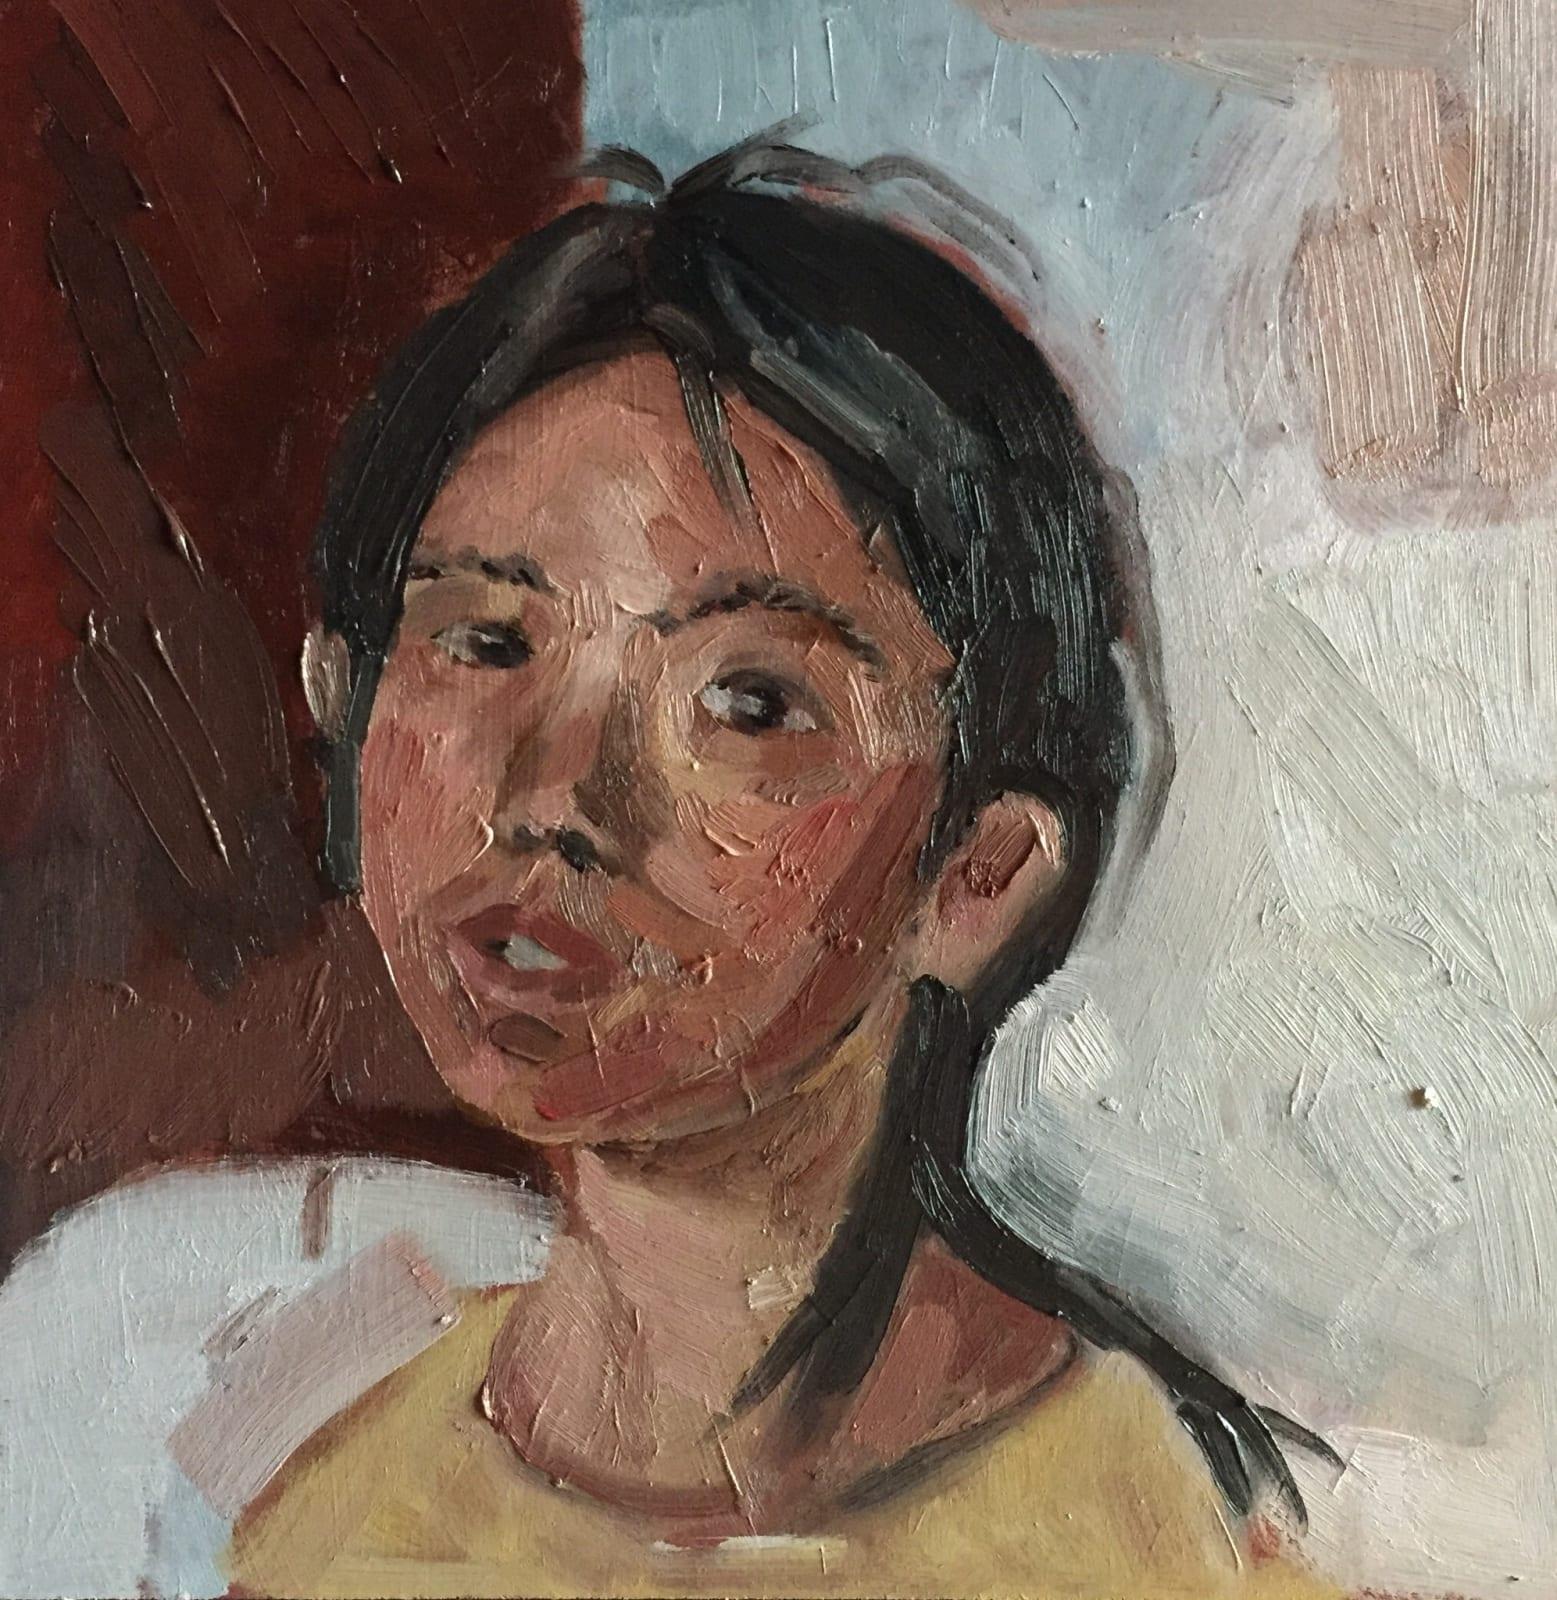 Xiao-Yang Li, My 12-Year-Old Self, 2015